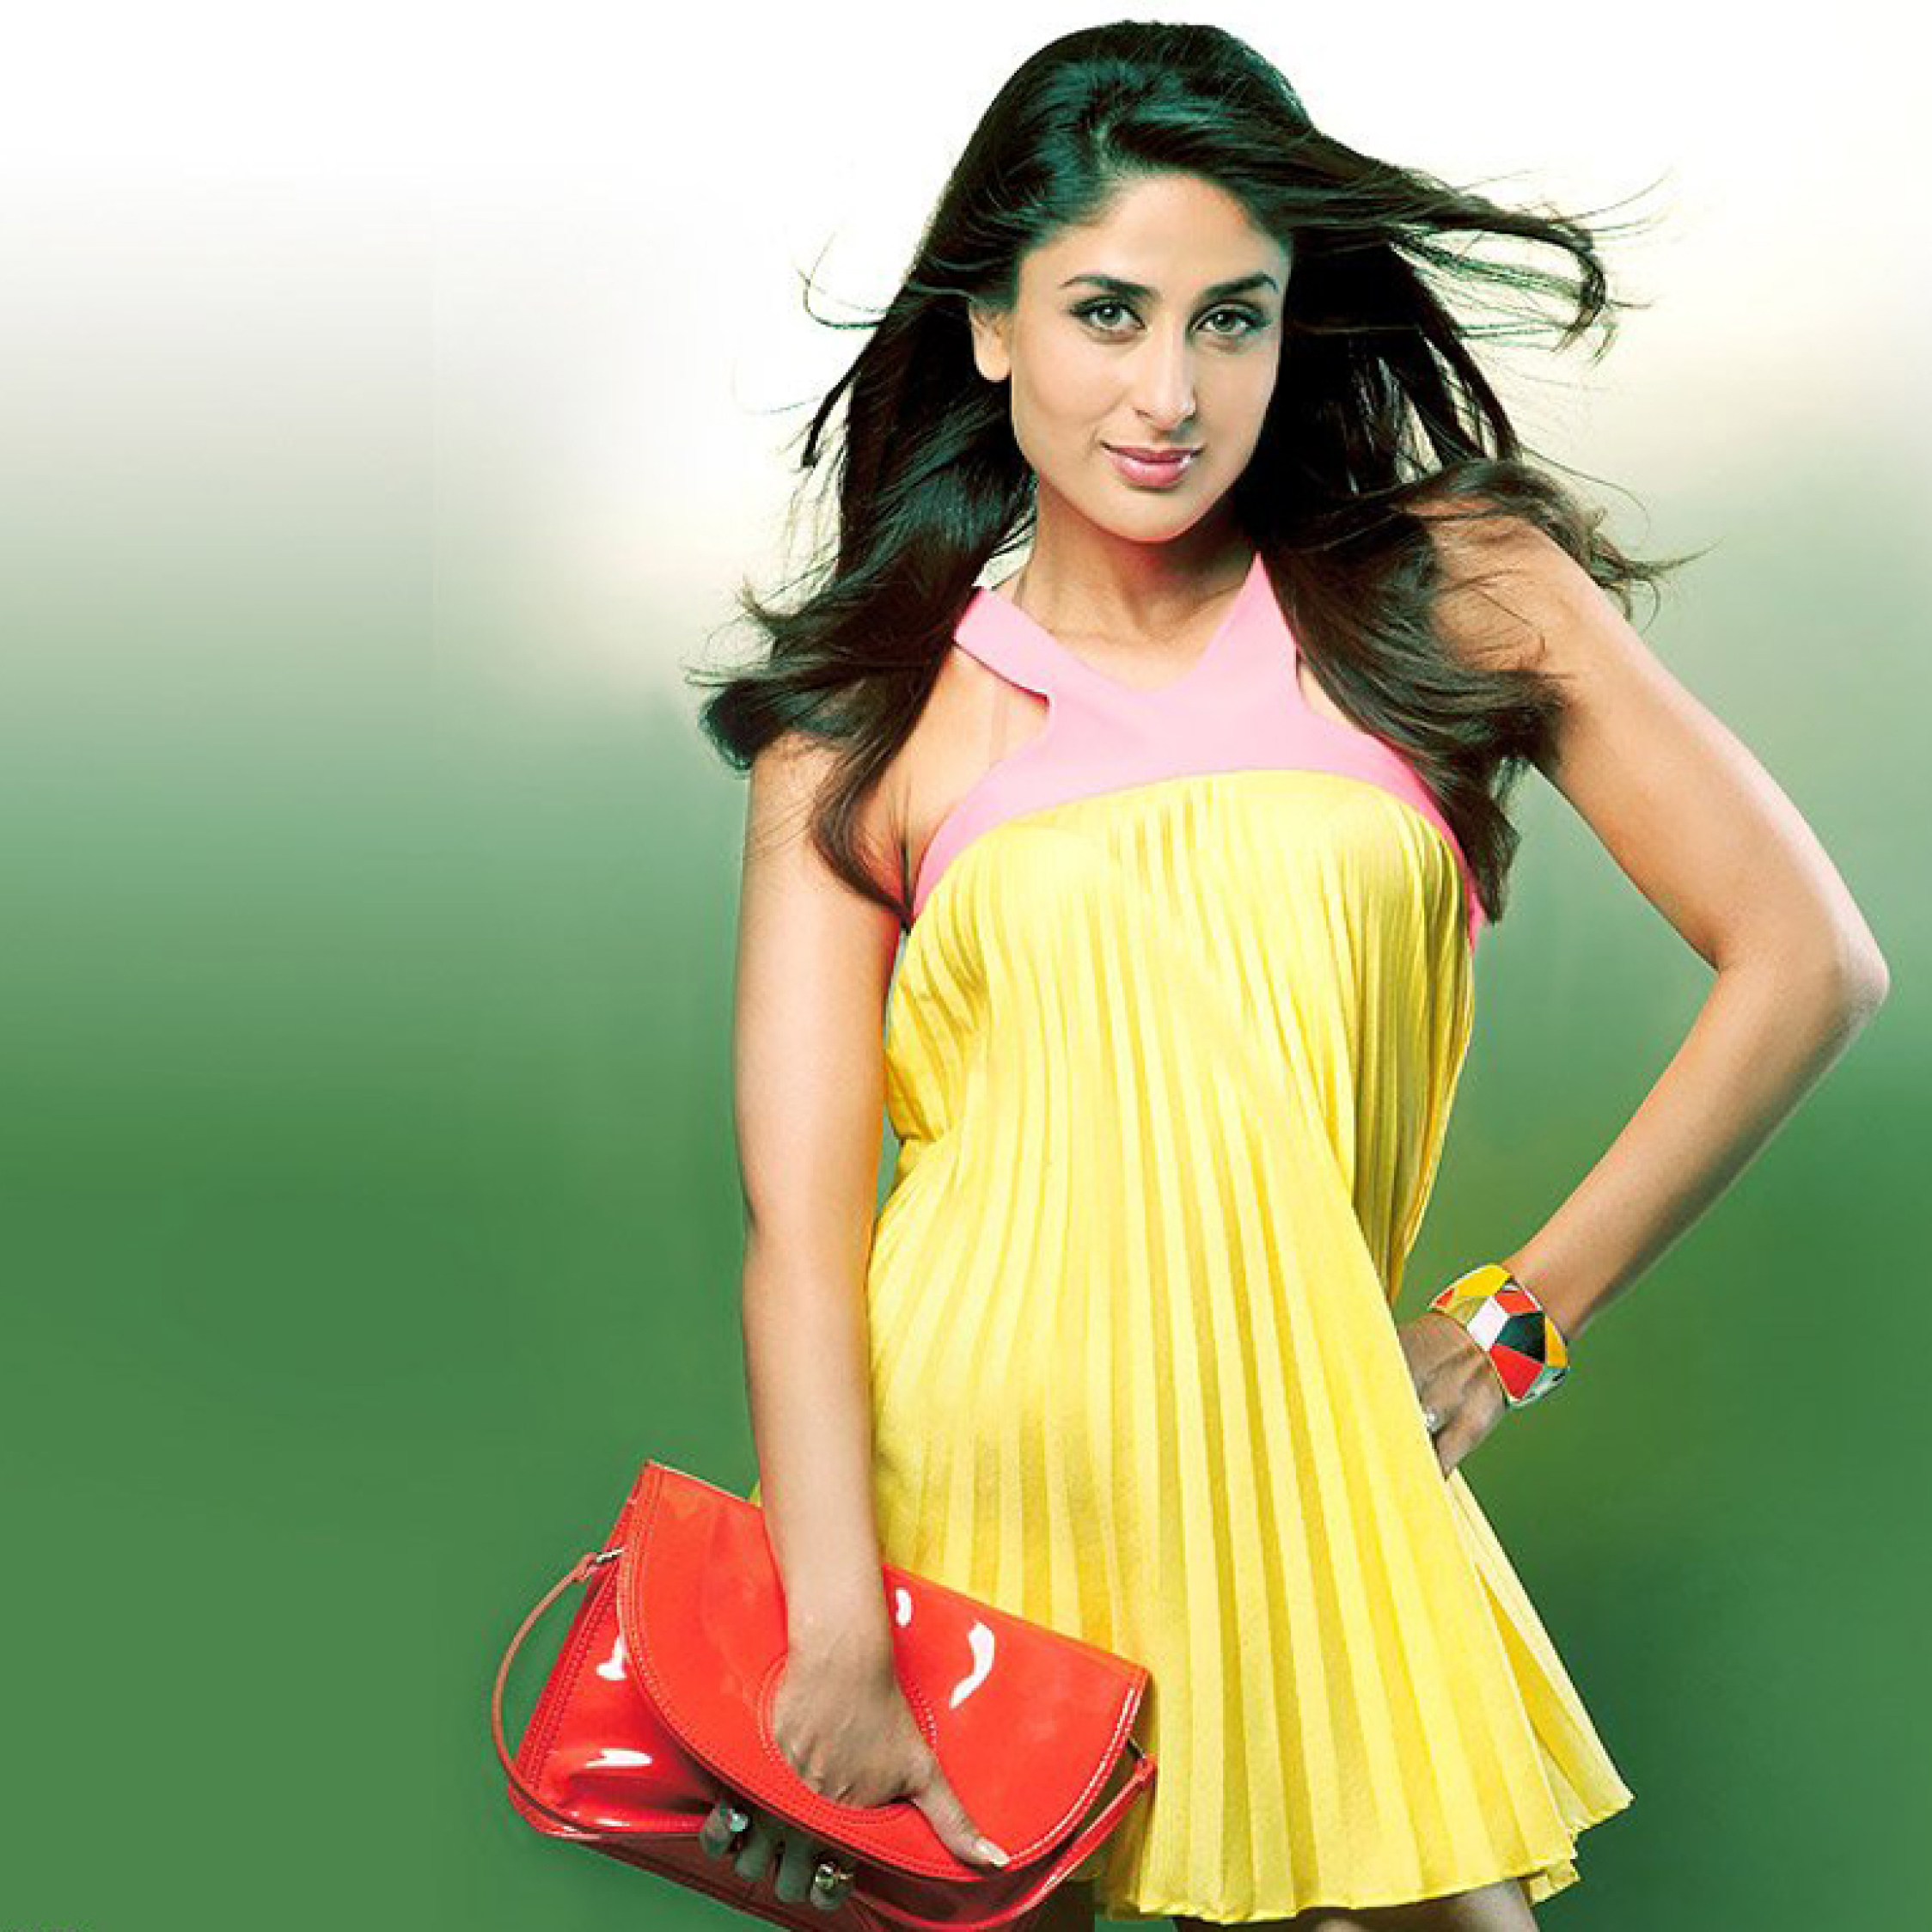 Kareena Kapoor Cute In Yellow Dress Photoshoot, HD Wallpaper